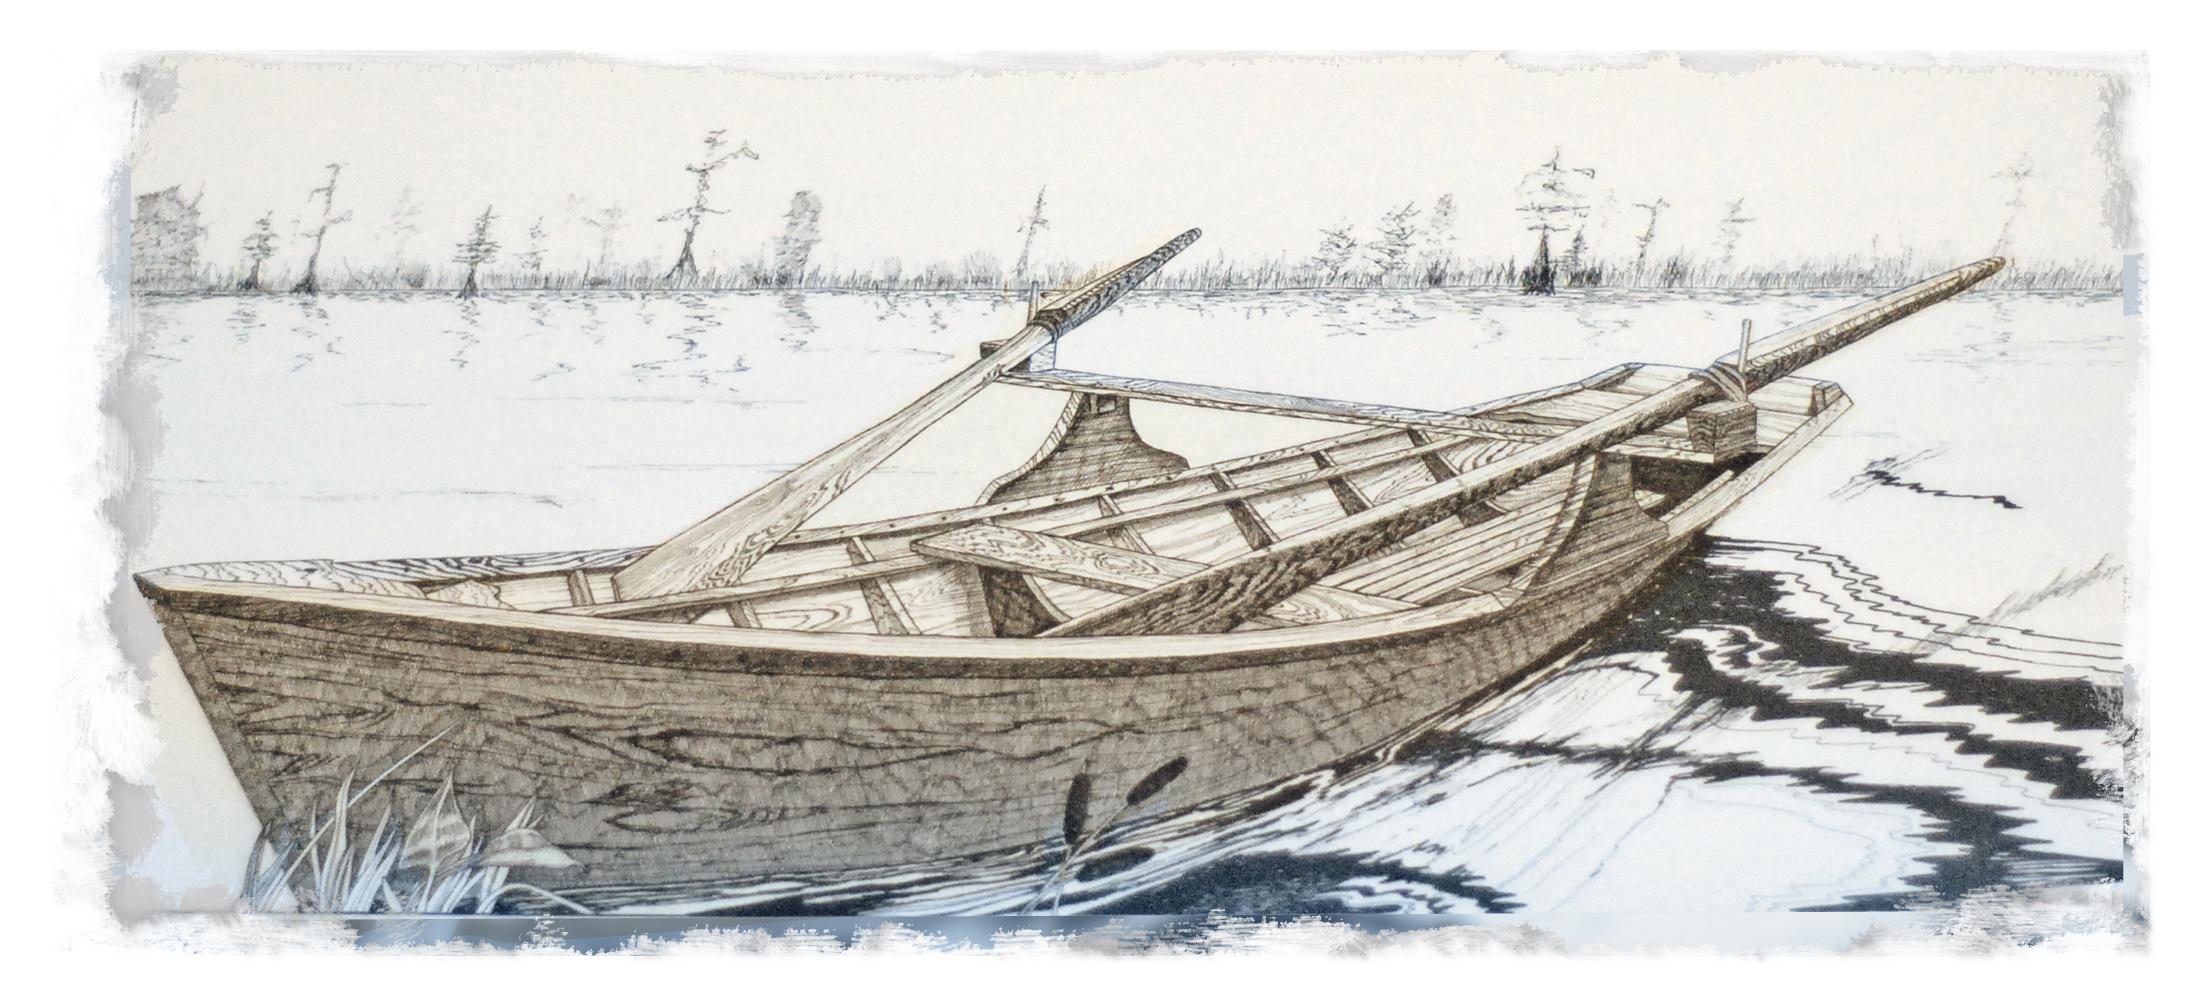 2200x1006 Seventh Bayou Teche Wooden Boat Show Set April 21 23 Teche Project